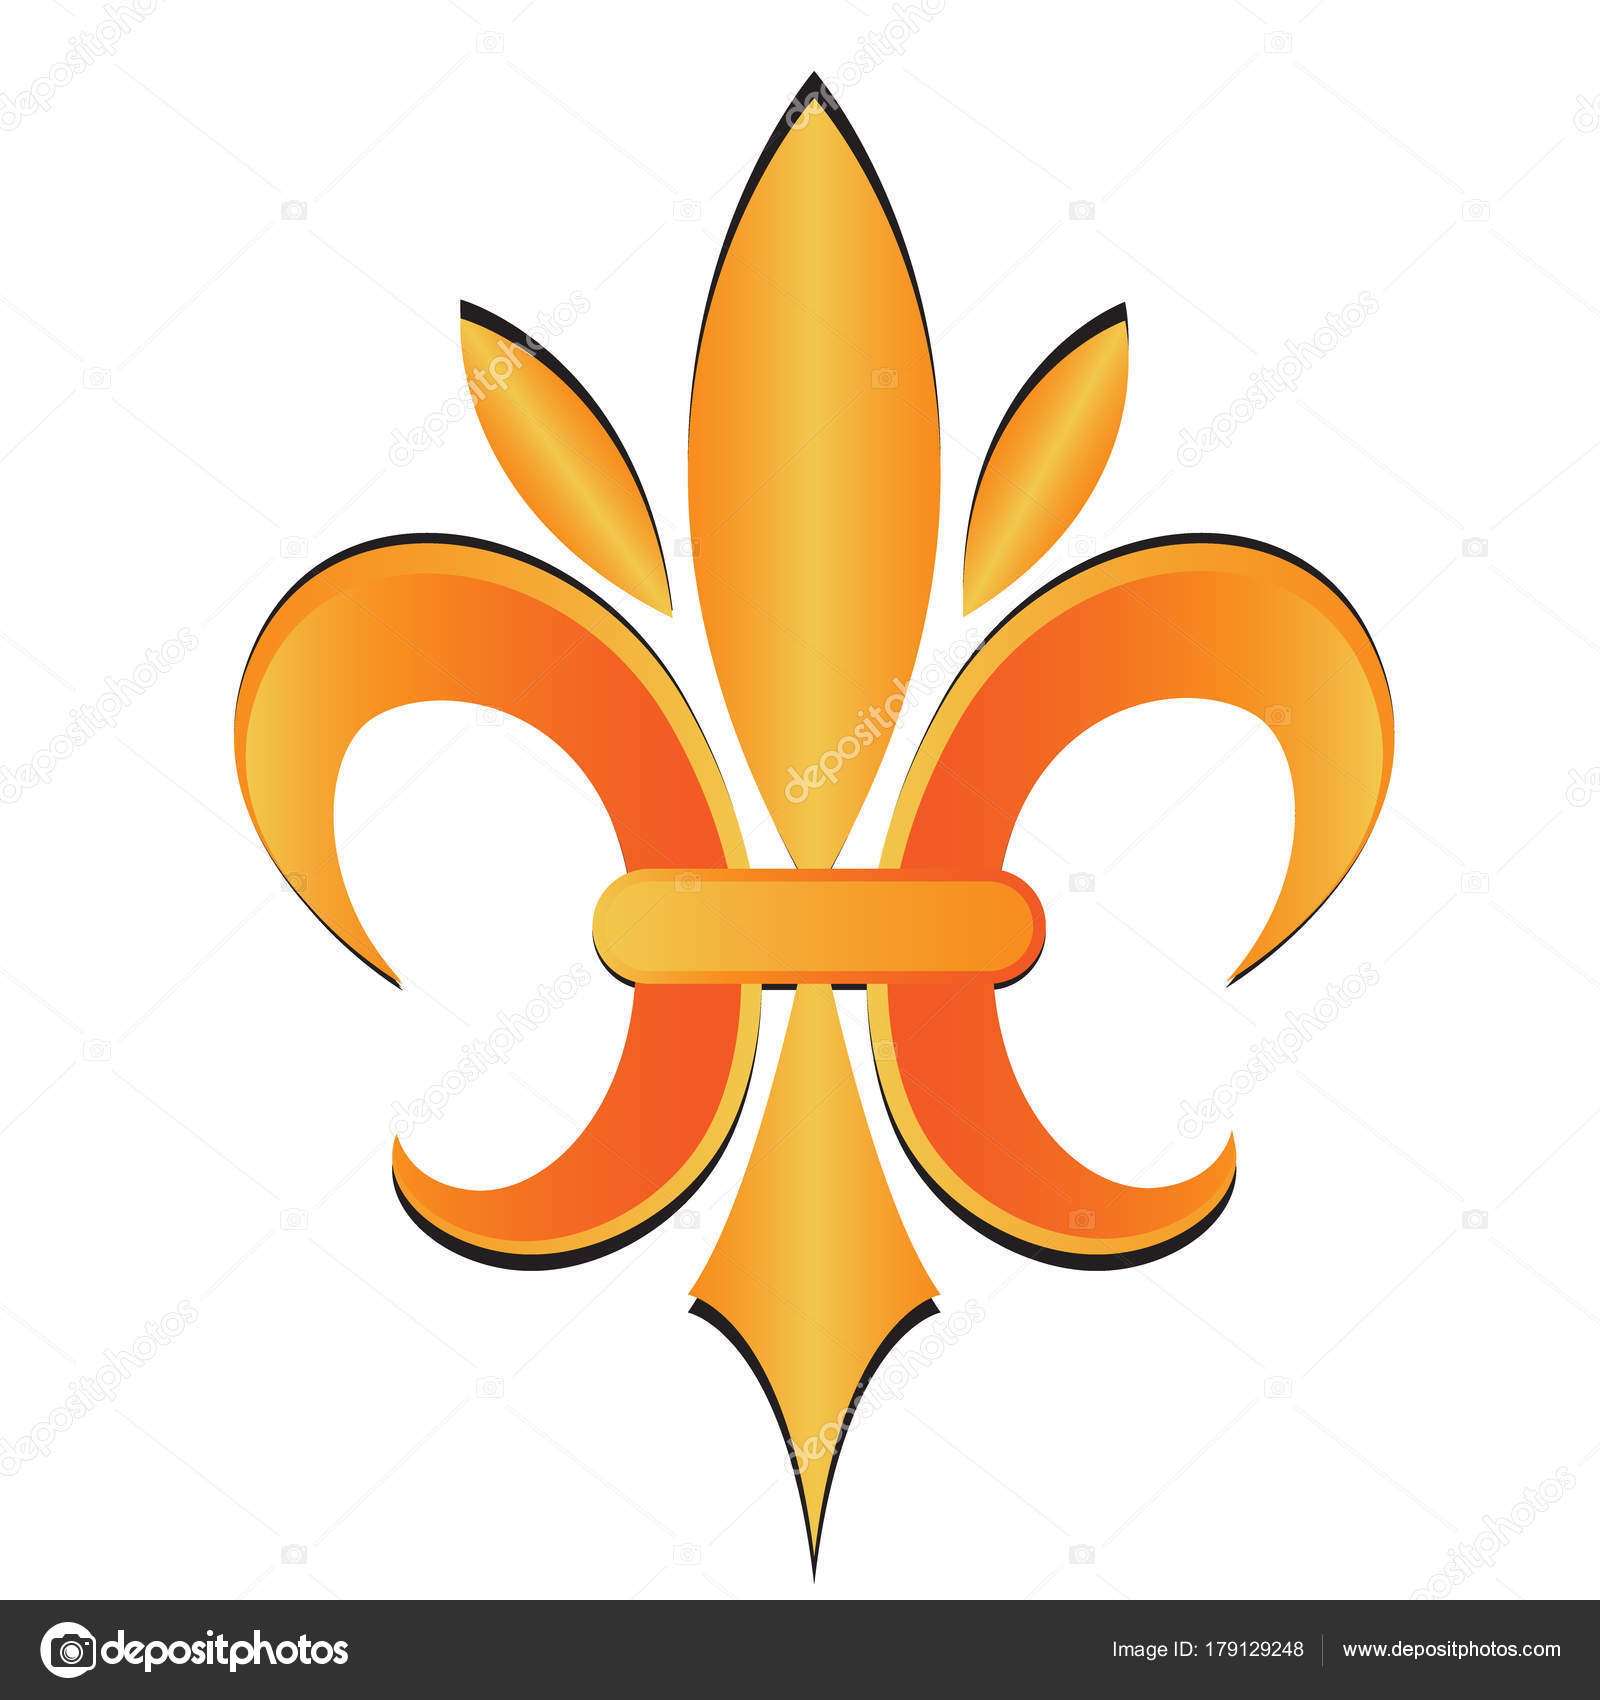 Gold fleur lis new orleans symbol flower logo icon vector stock gold fleur lis new orleans symbol flower logo icon vector stock vector buycottarizona Choice Image